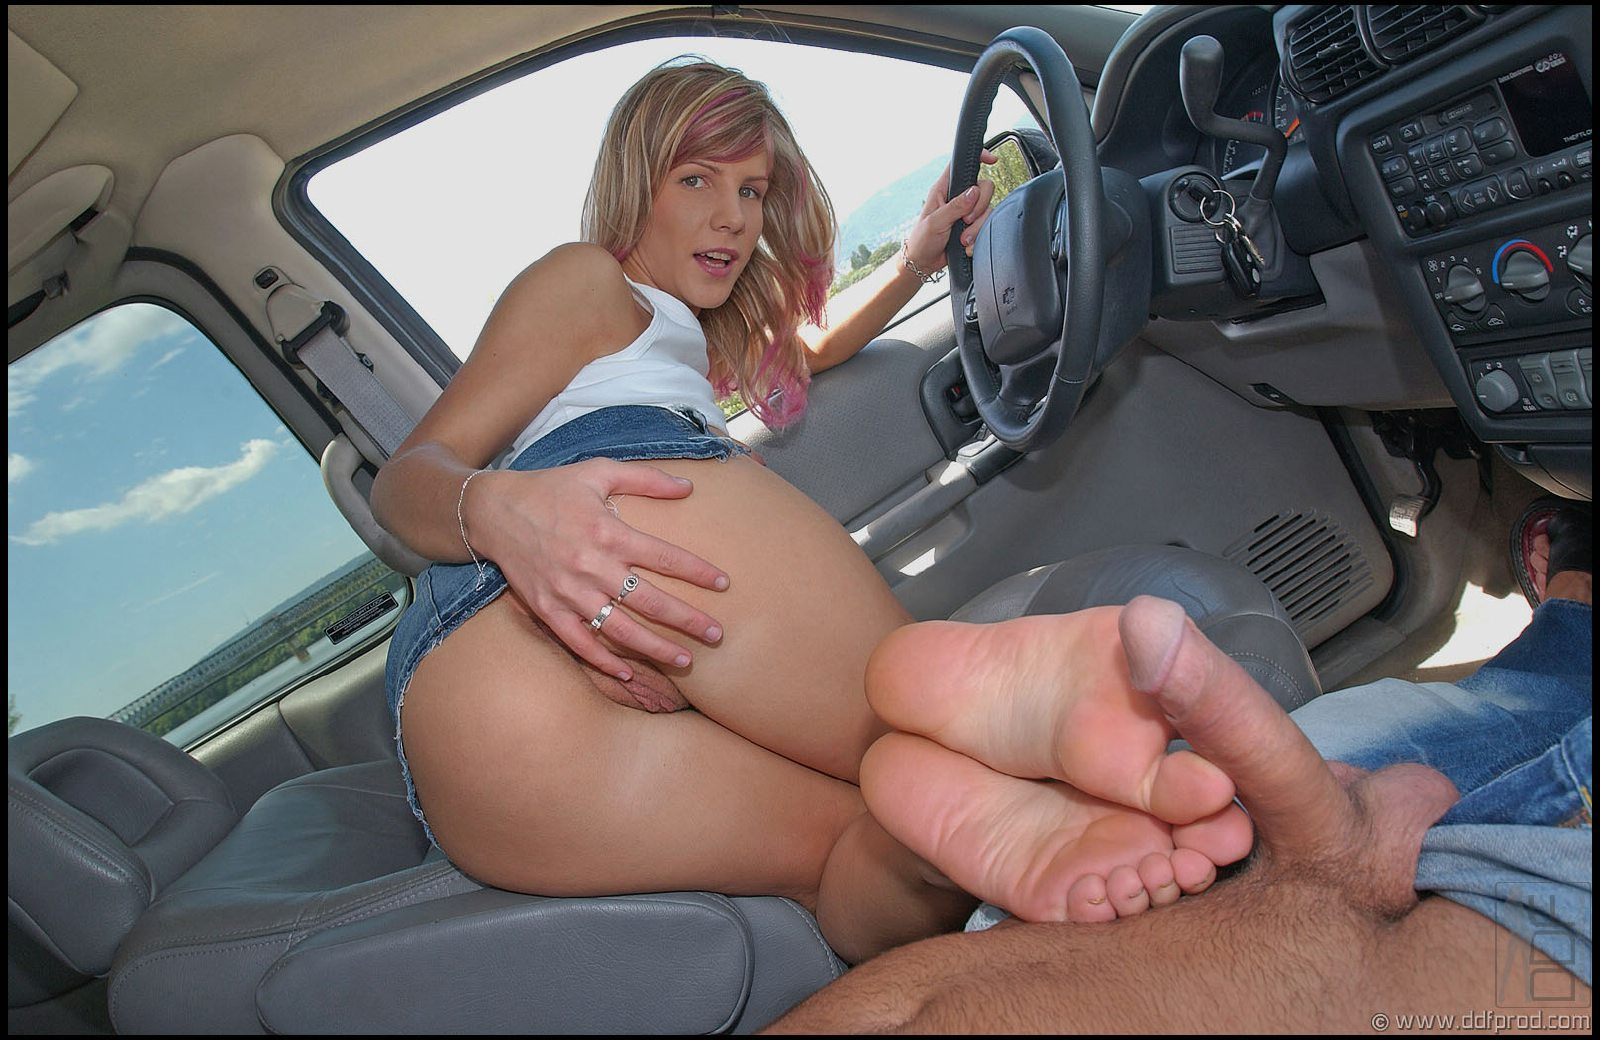 Footjob in the car cum